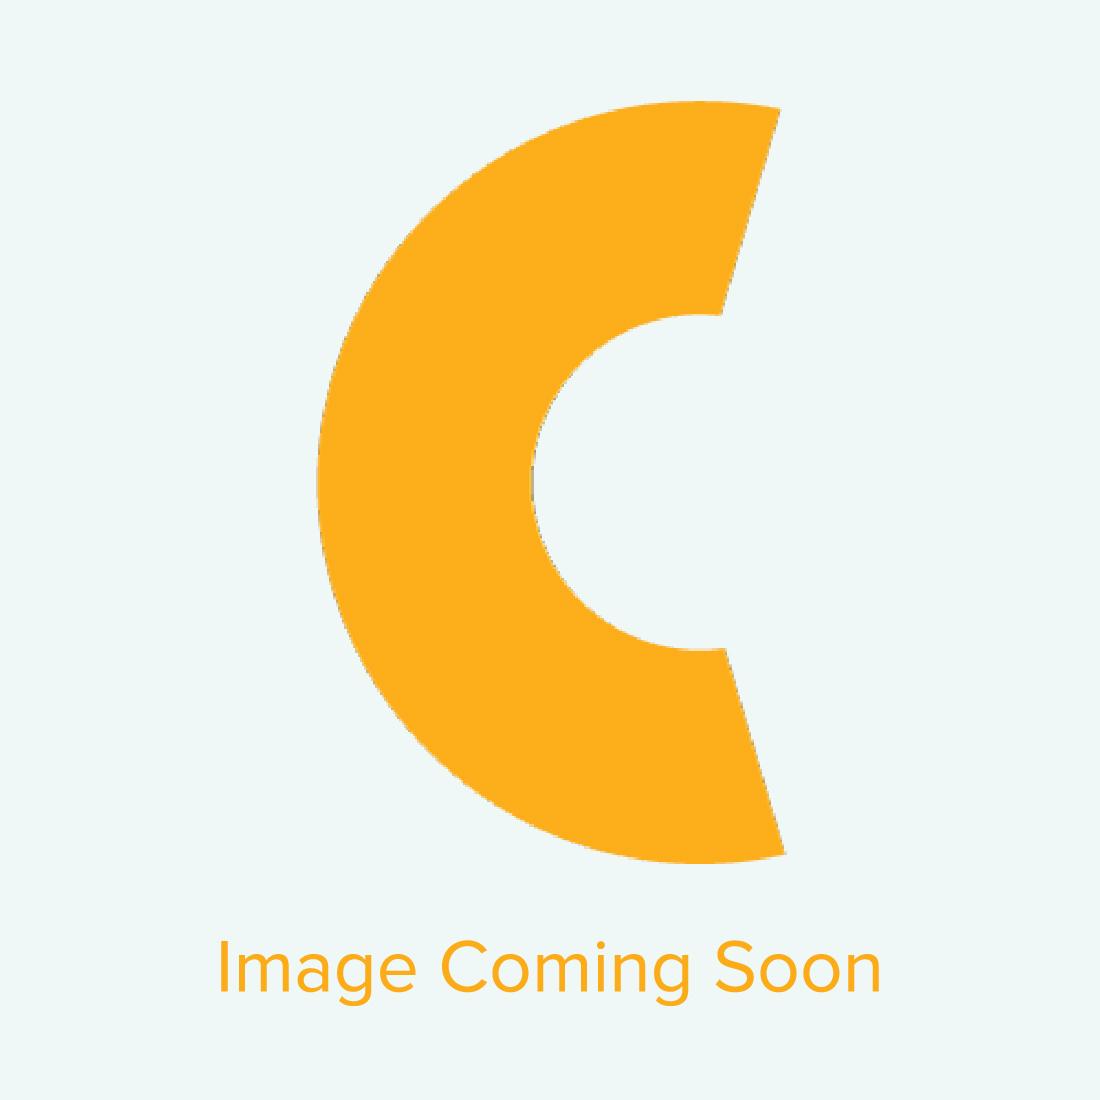 "ChromaLuxe Creative Borders Sublimation Photo Panel - Crete Design 11.5"" x 5.75"""